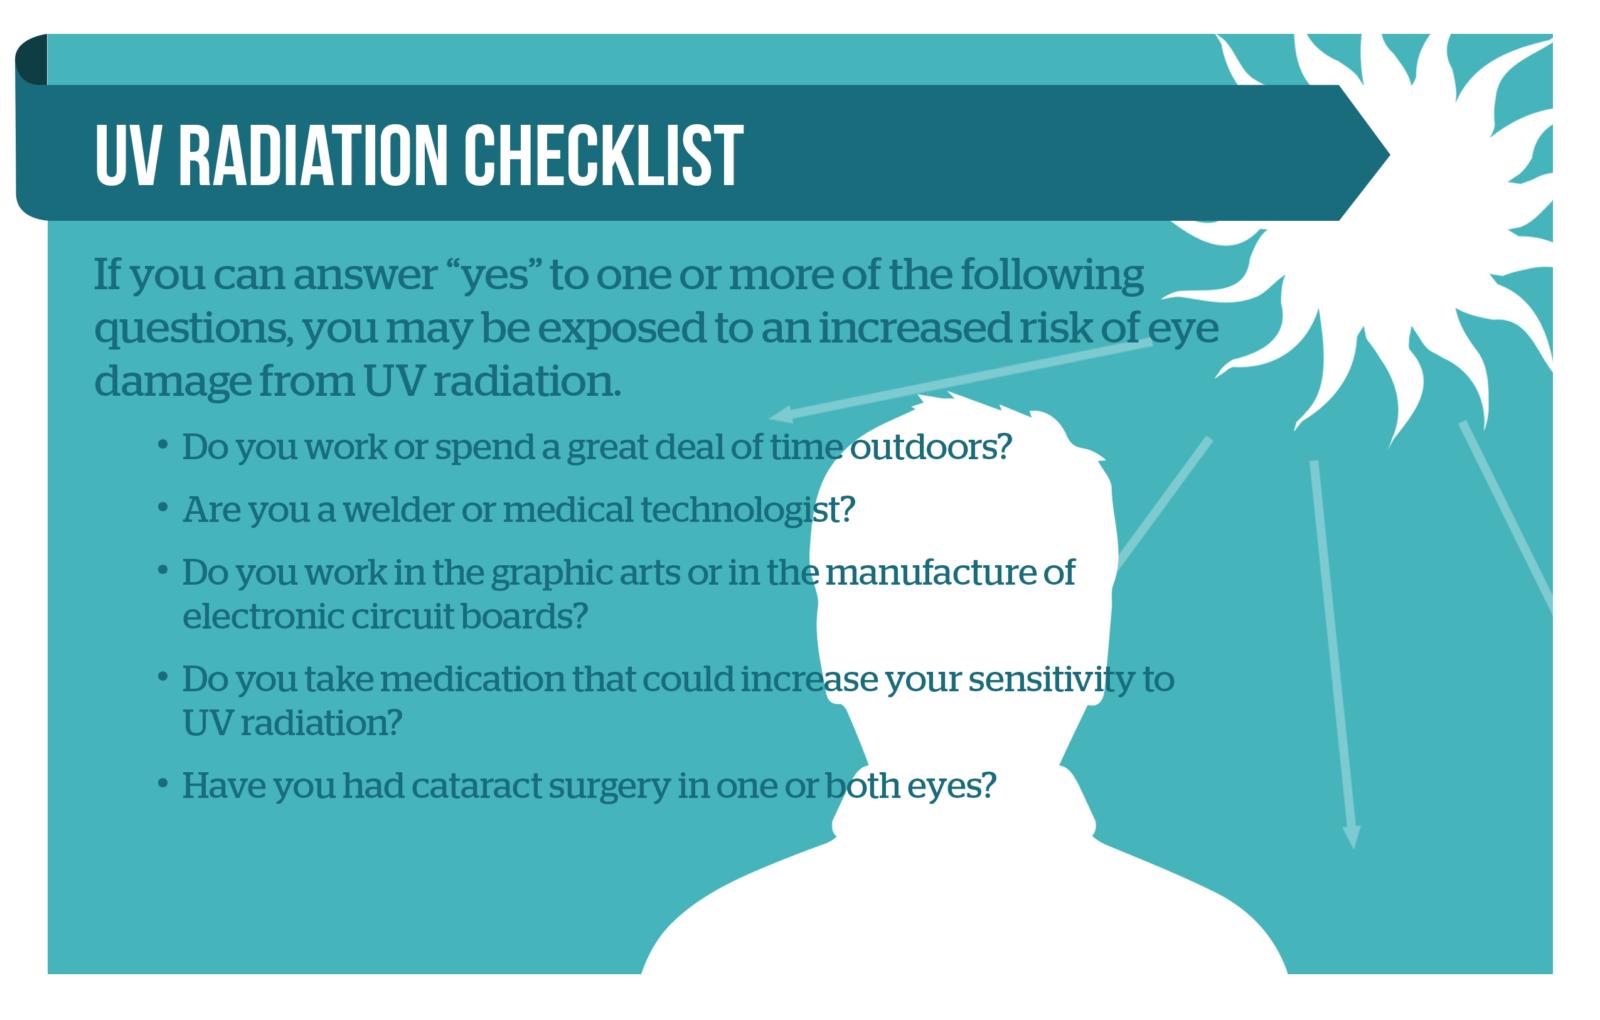 uv radiation checklist.png